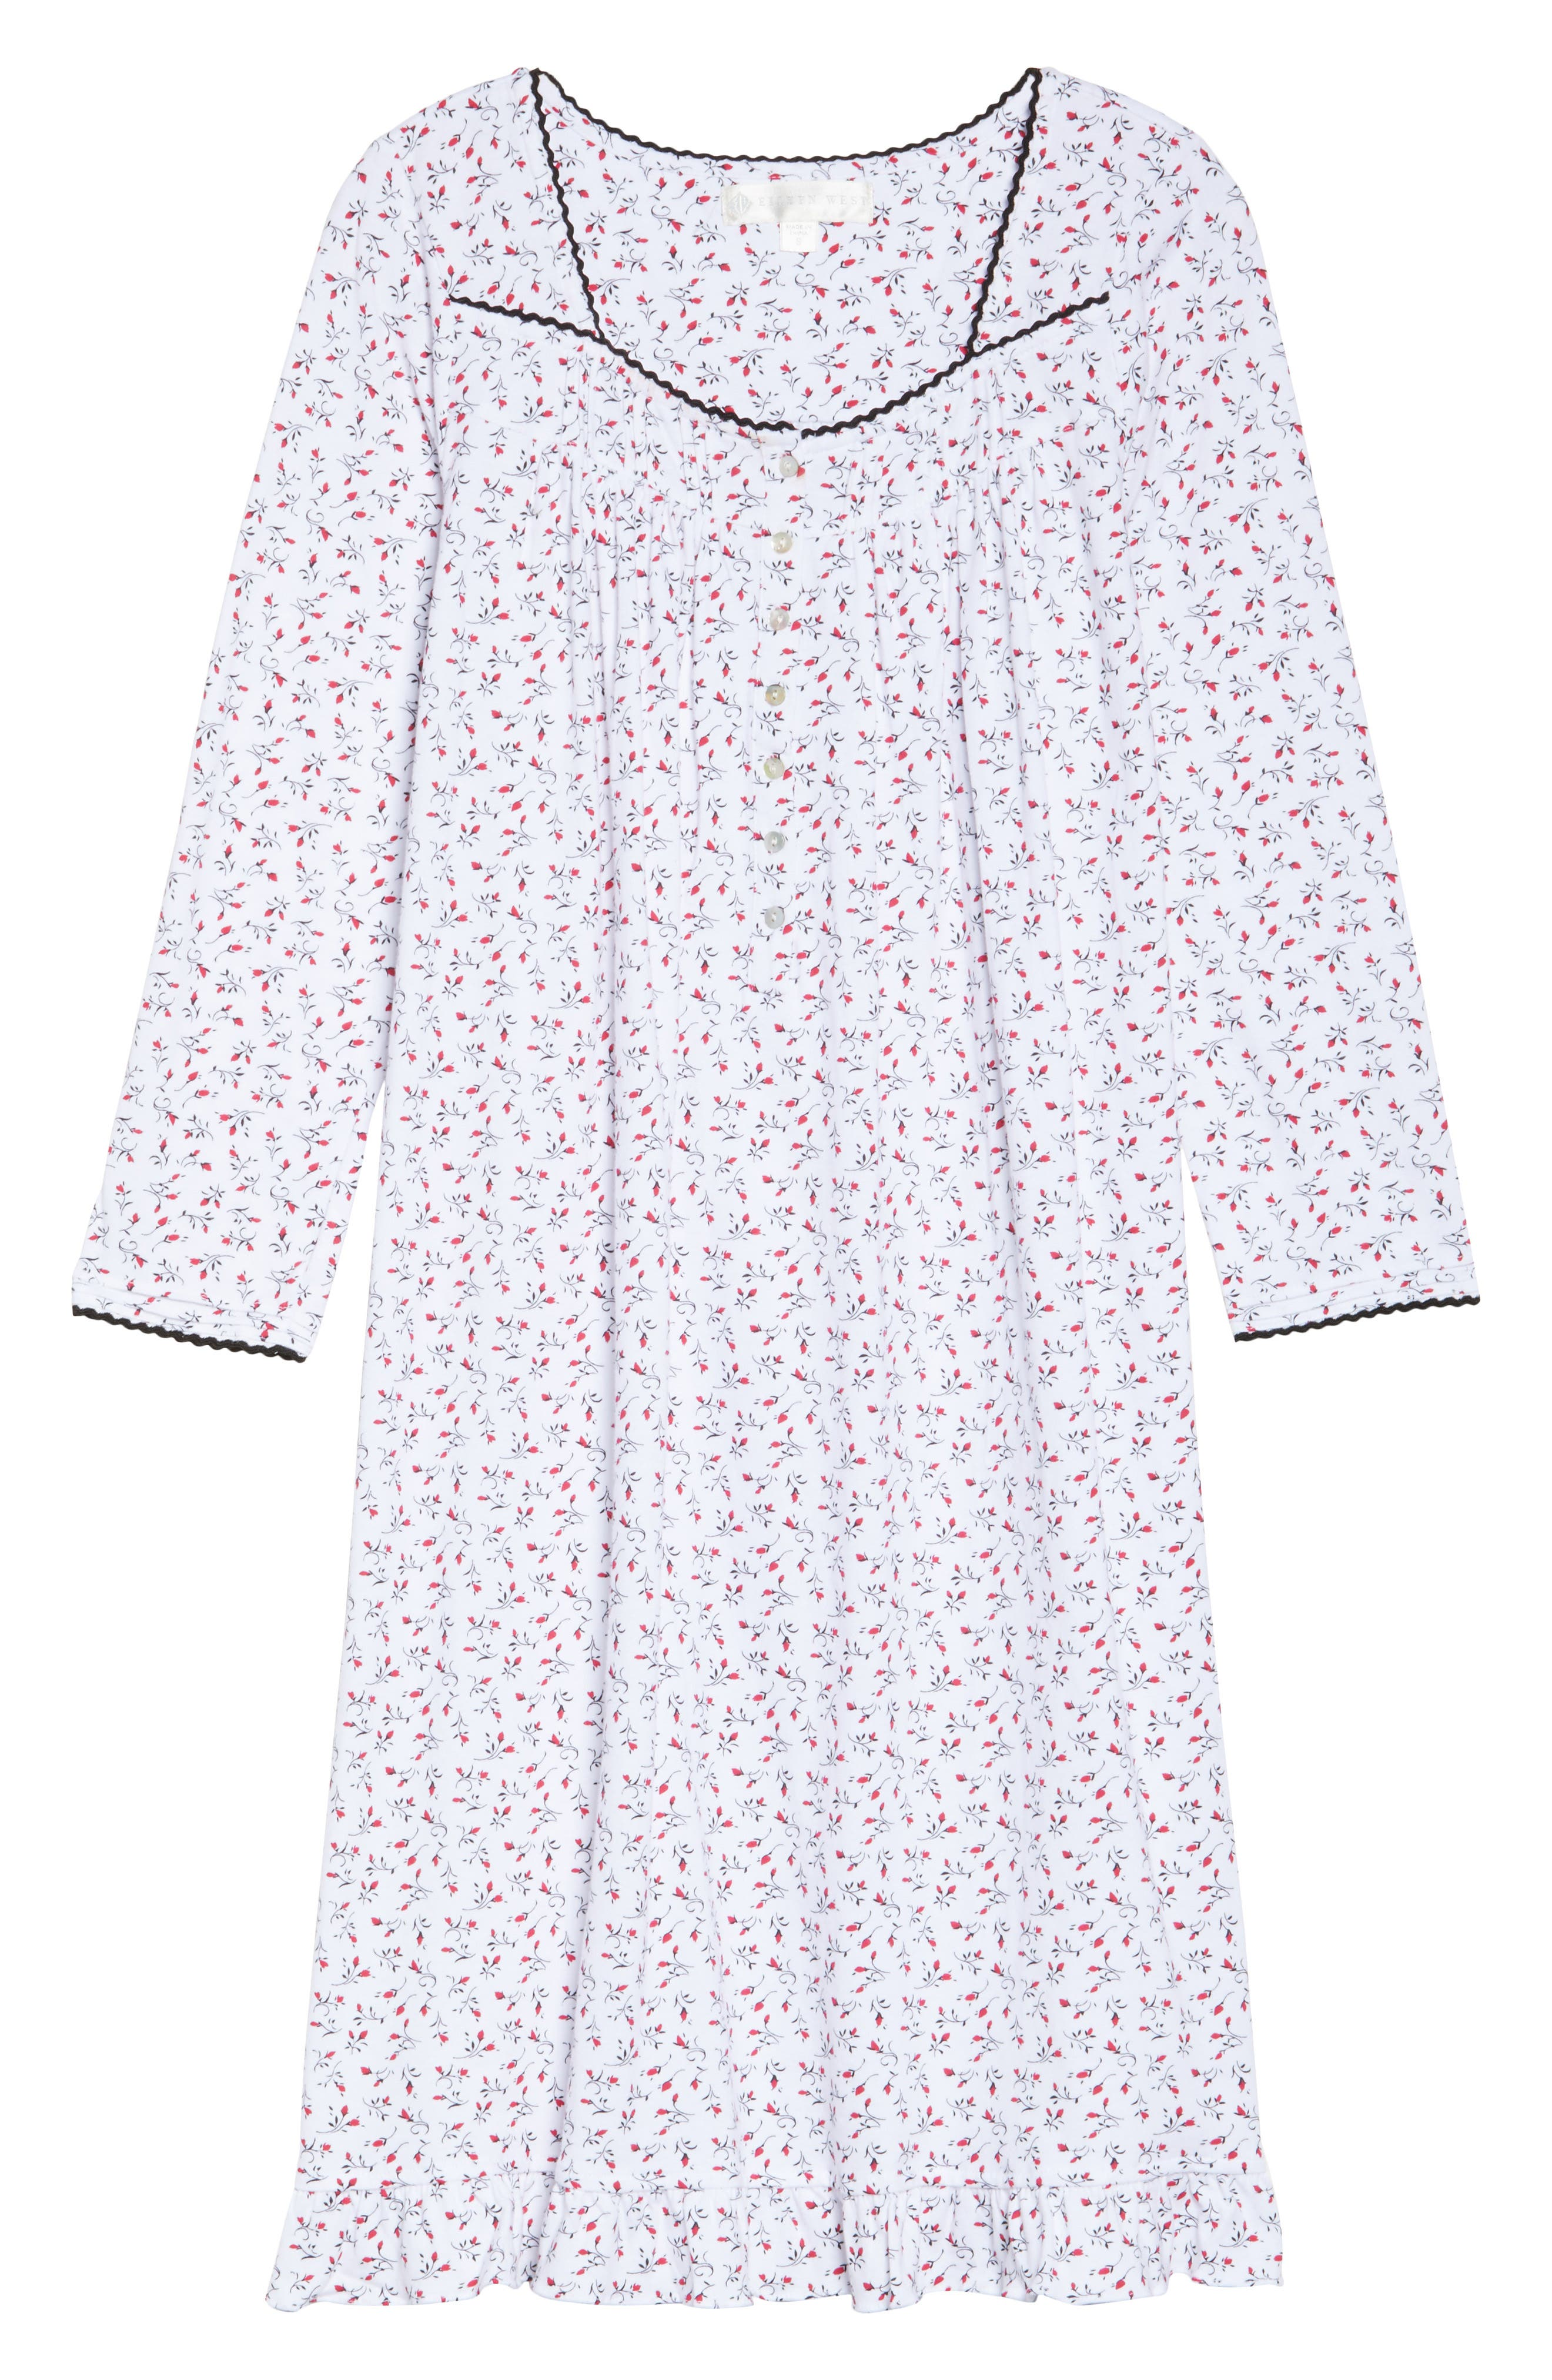 Short Nightgown,                             Alternate thumbnail 6, color,                             164